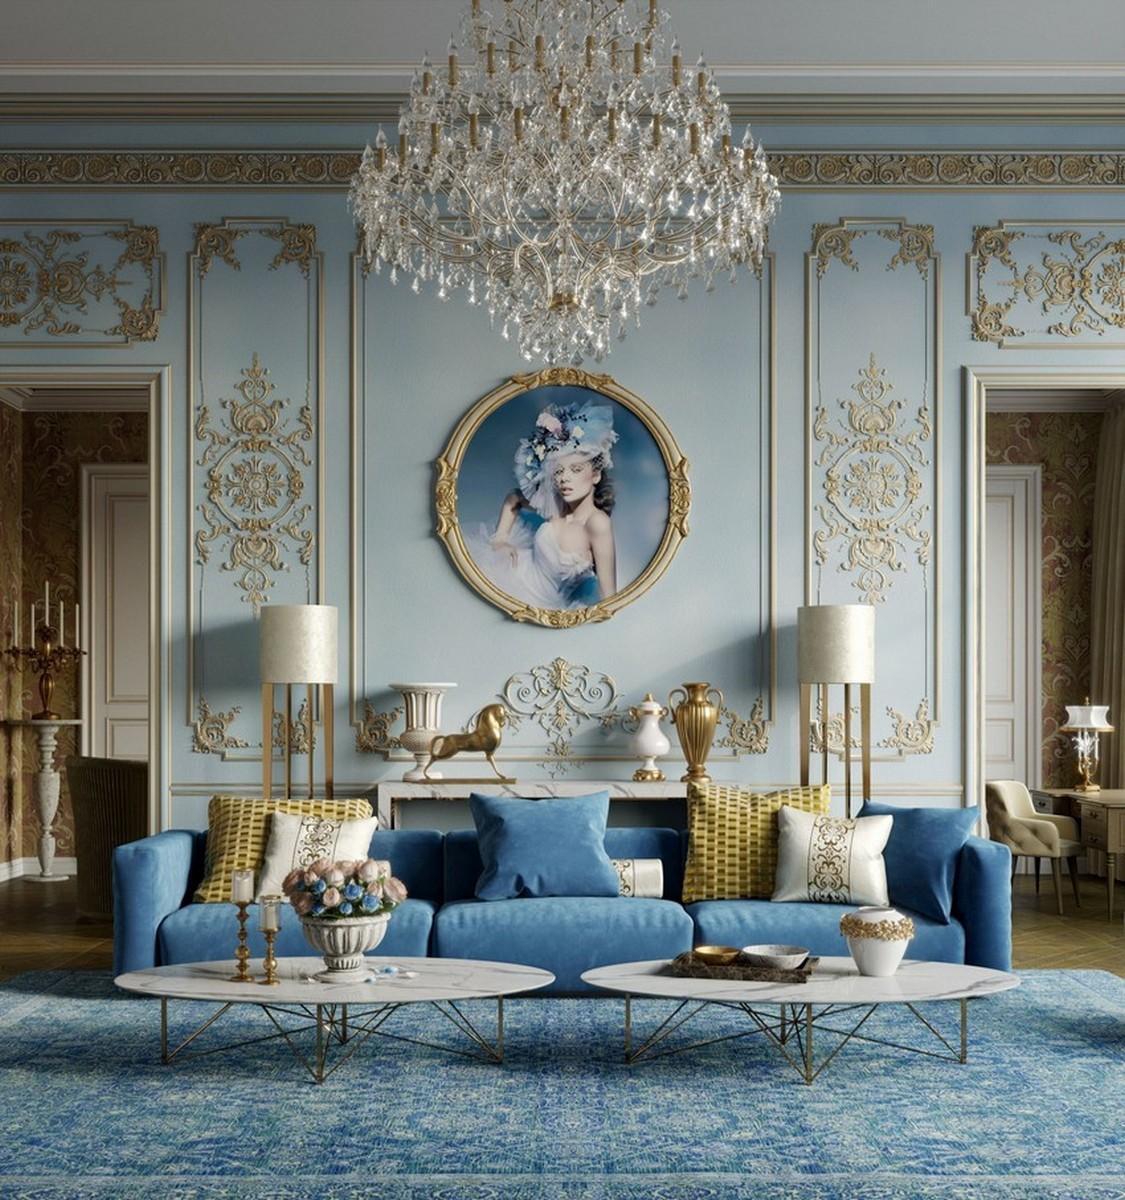 Tendencias de Interiores: Sala de Estar poderosas y lujuosas tendencias de interiores Tendencias de Interiores: Sala de Estar poderosas y lujuosas 15958514f72a53bc5d01f2acf58e929a